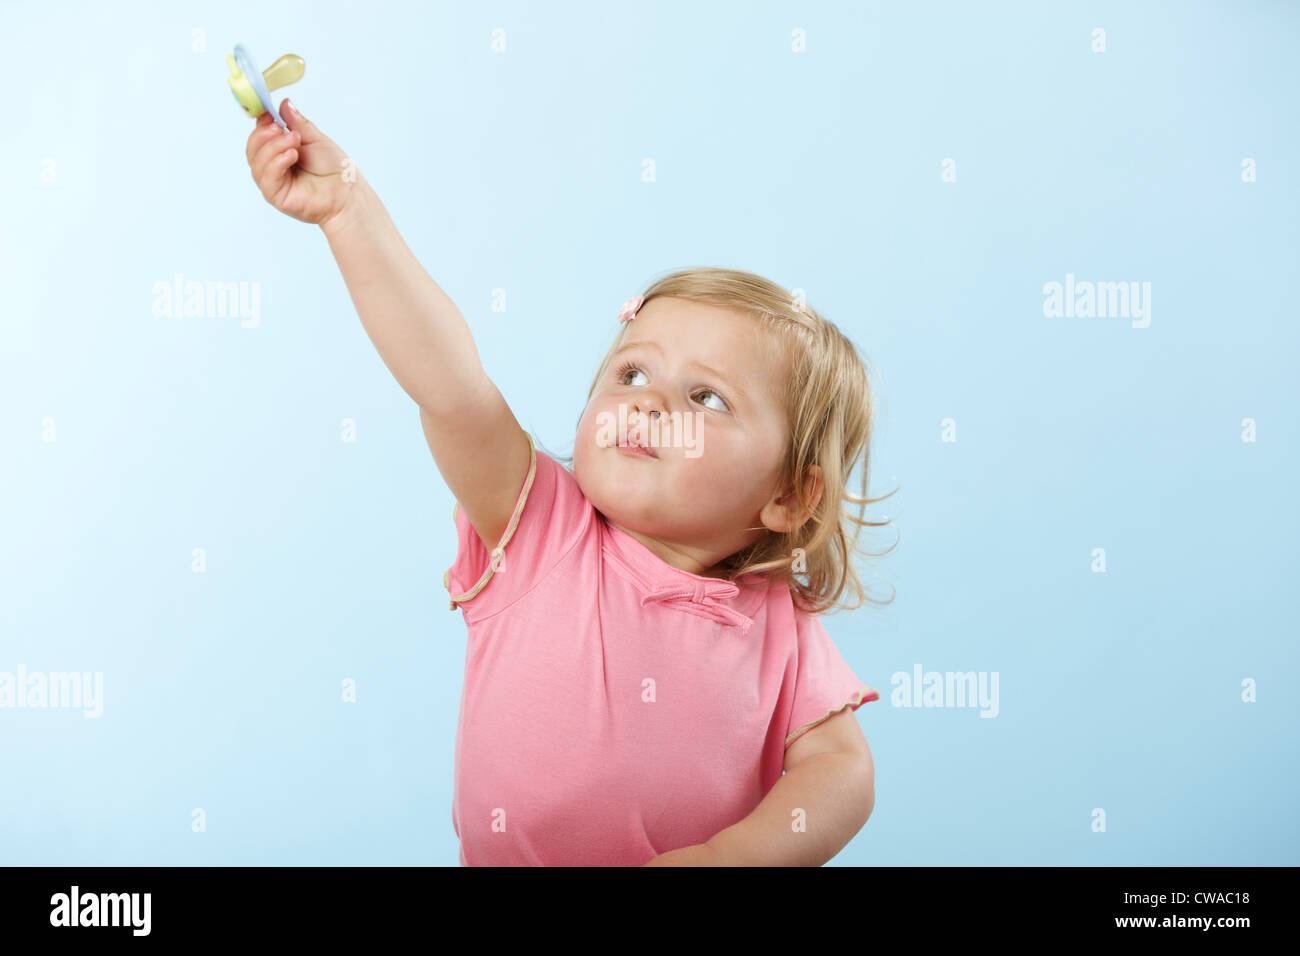 Mädchen halten Schnuller Stockbild